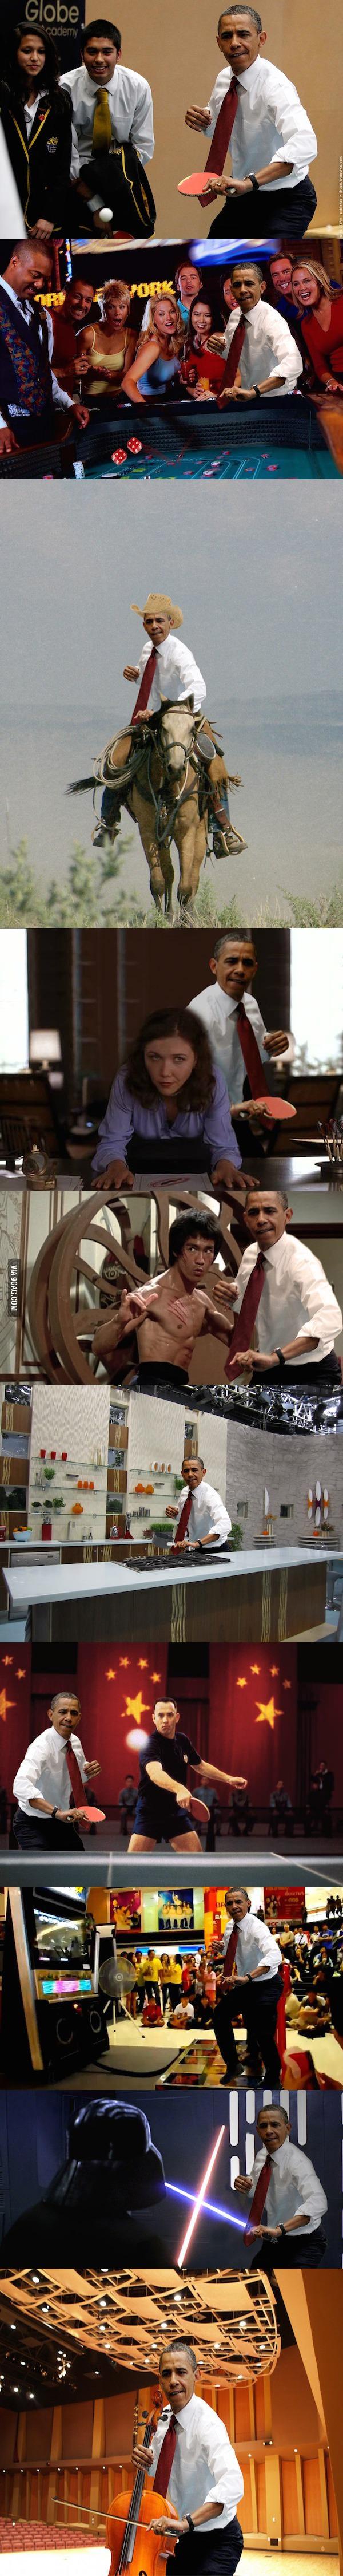 Obama-playing-table-tennis-photoshopped